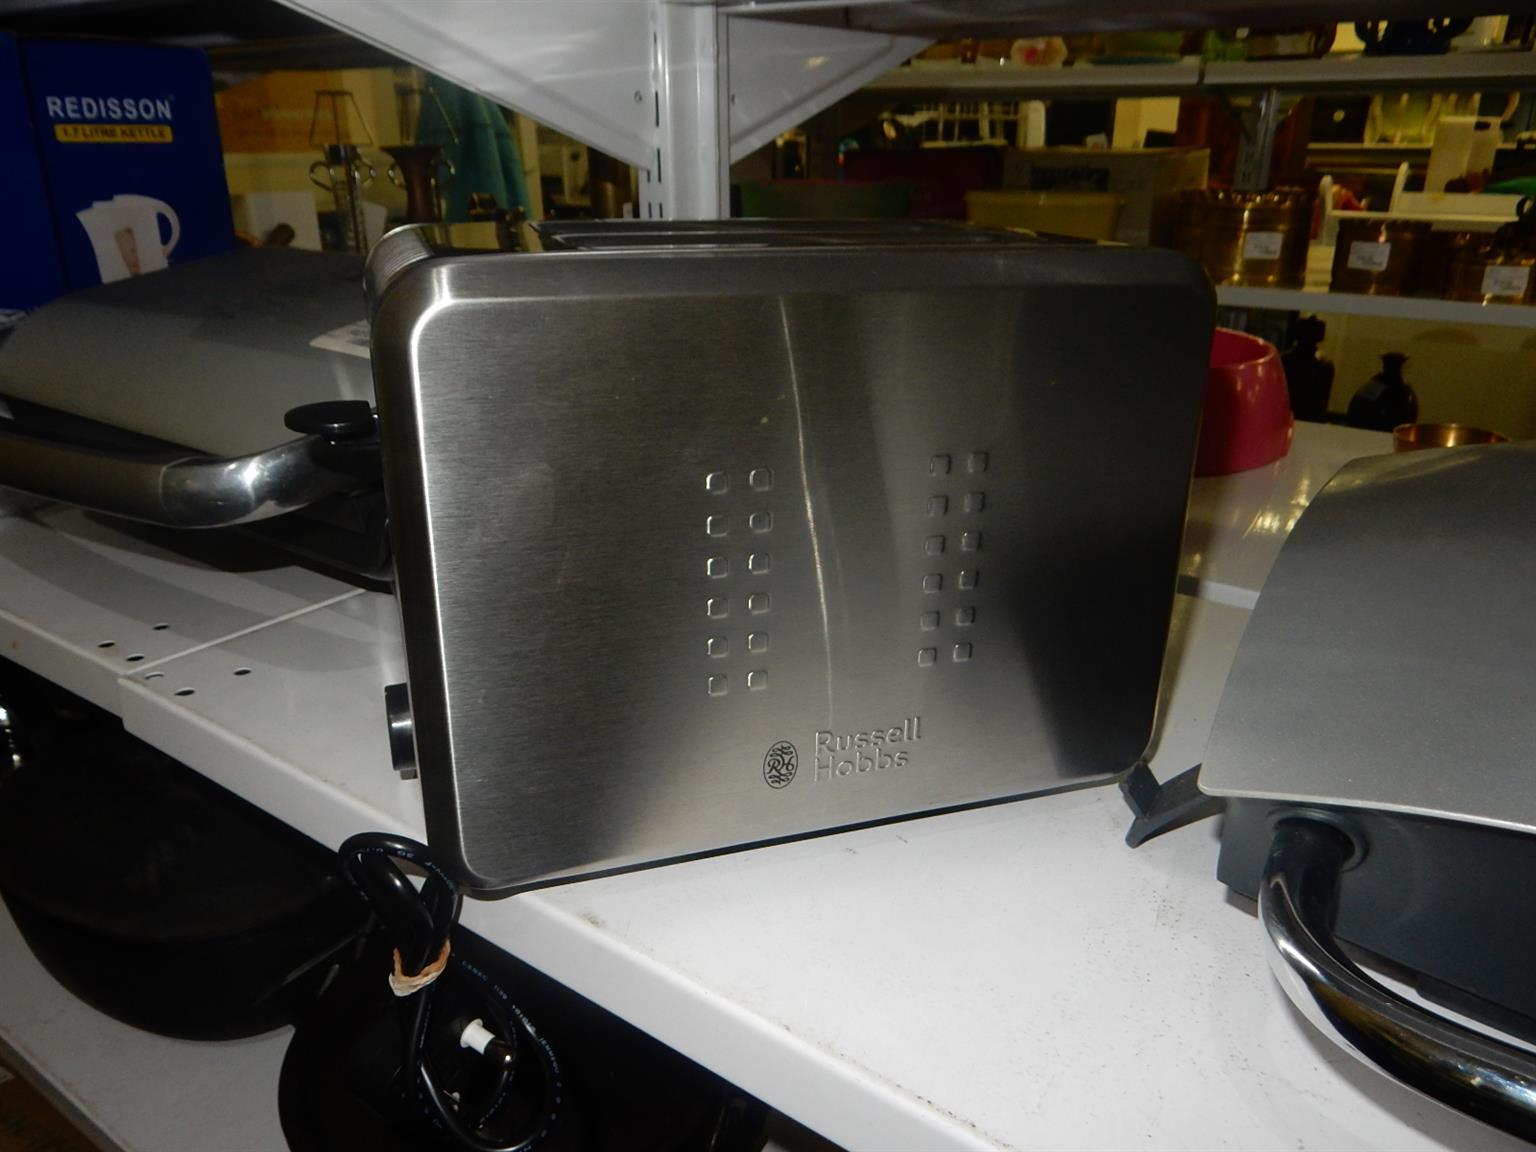 Russel Hobbs 2 Slice Toaster